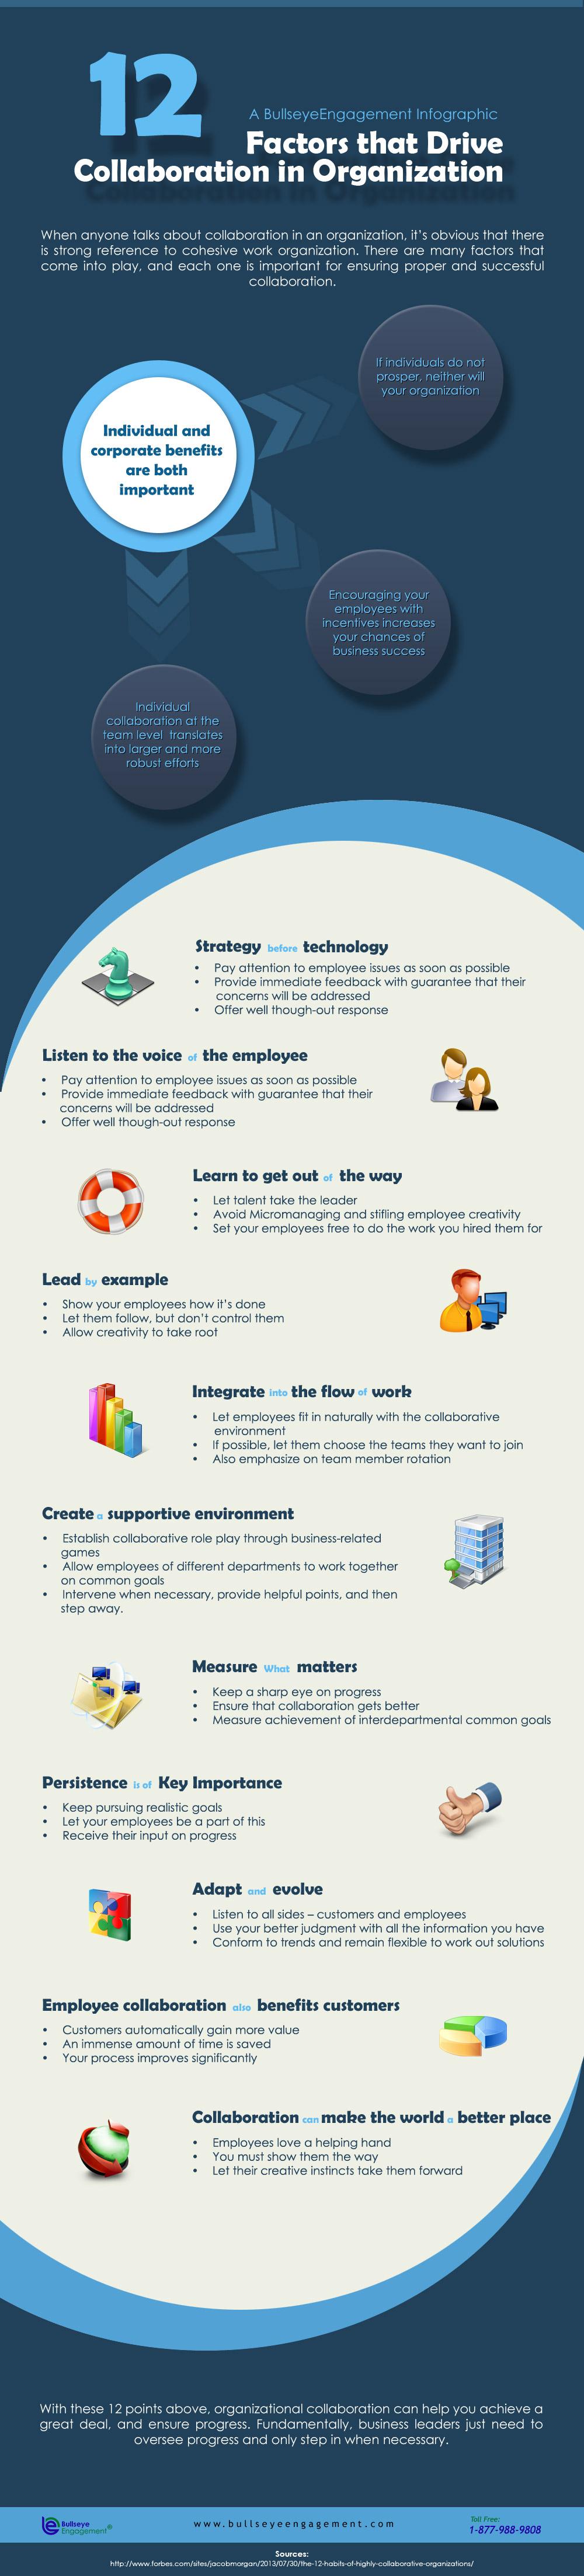 12 Factors that Drive Collaboration in Organization http://bit.ly/1lLuQL6